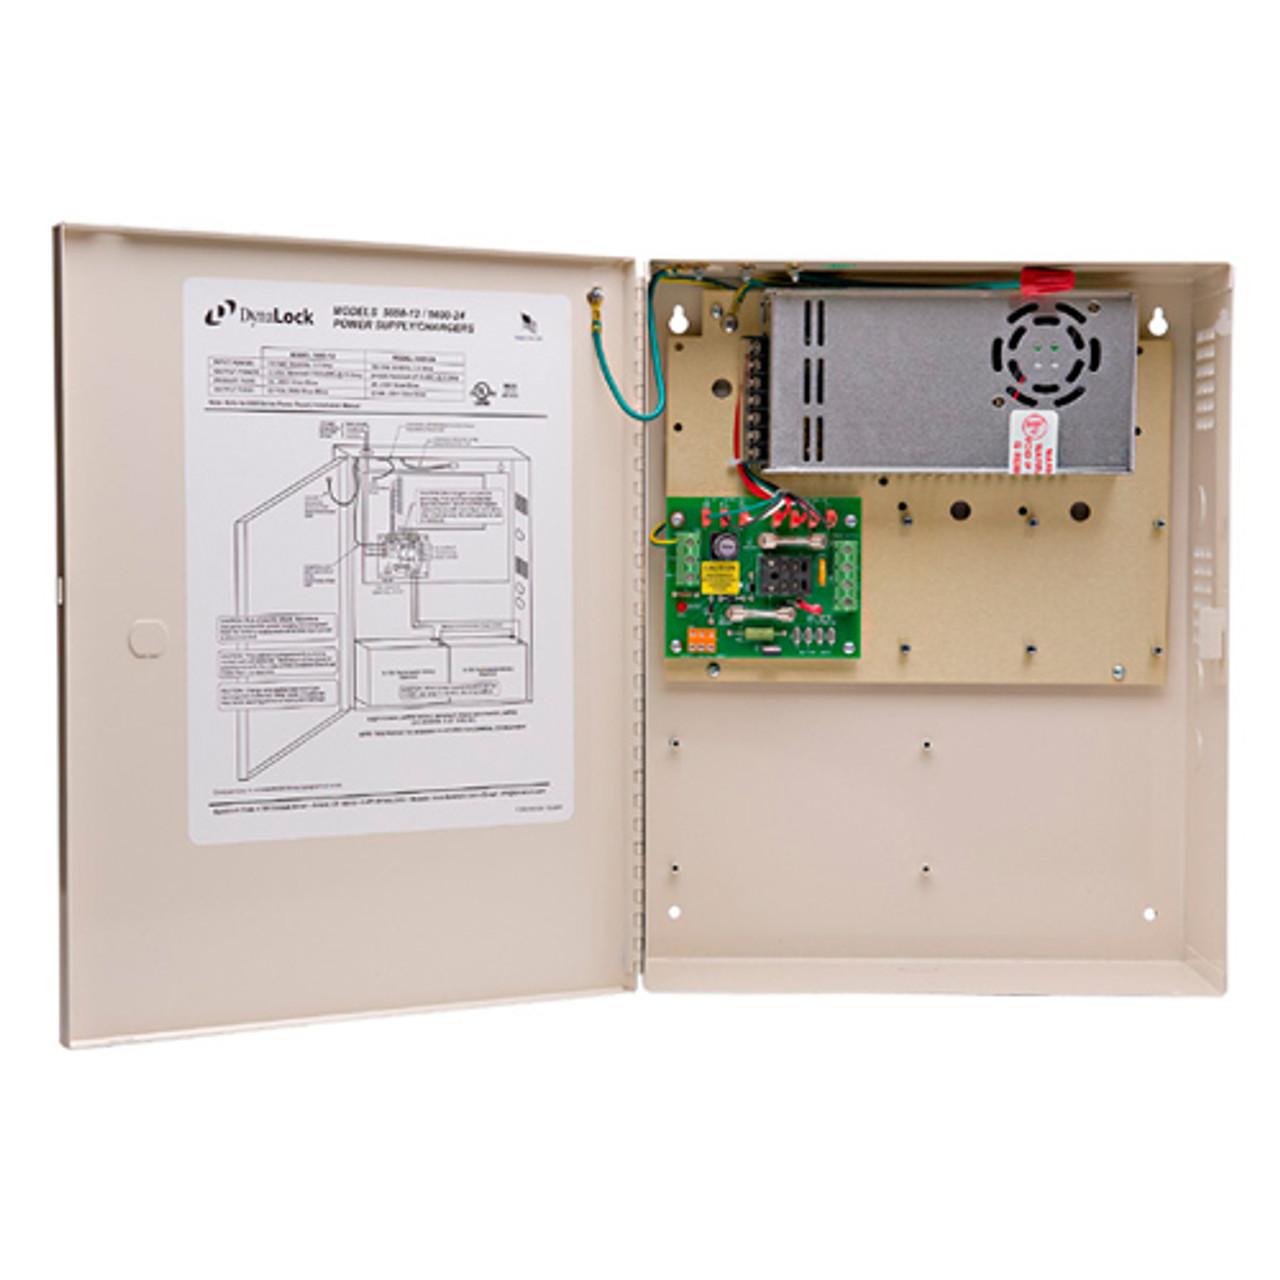 small resolution of 5600 12 ilb dynalock multi zone heavy duty 12 vdc power supply with interlock logic board lock depot inc